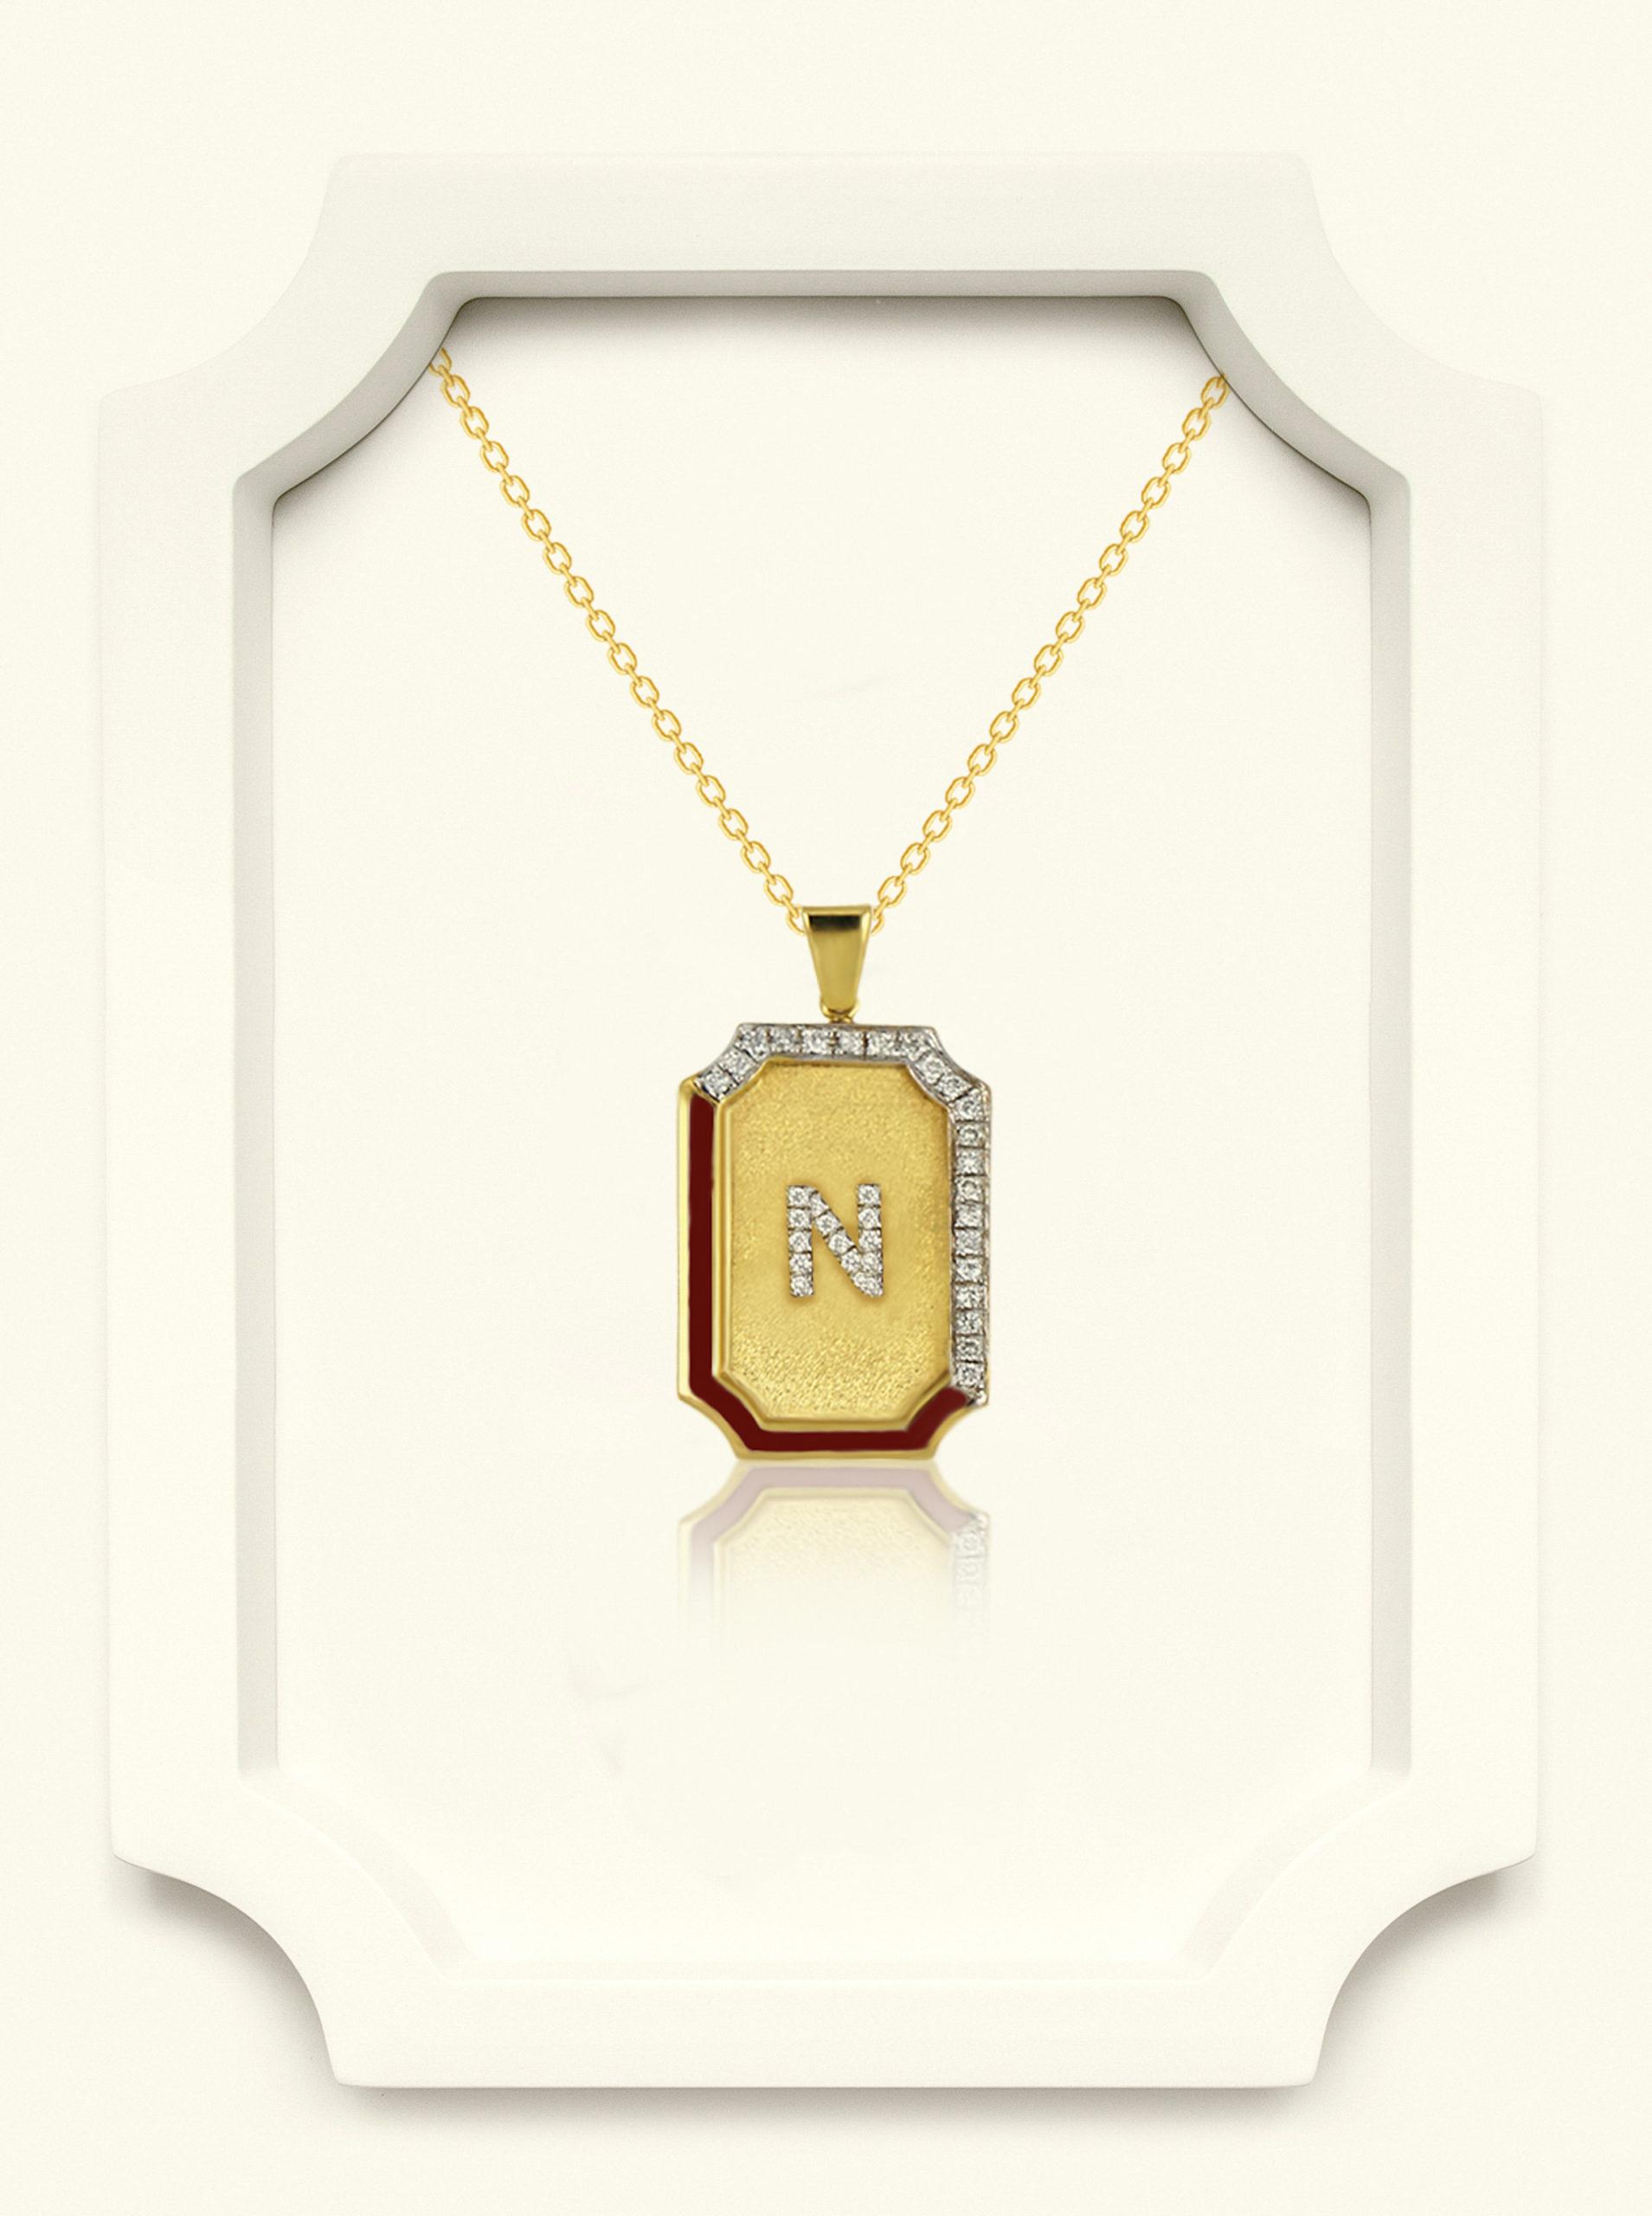 Saba Yellow Gold Signature Pendant With Black Enamel